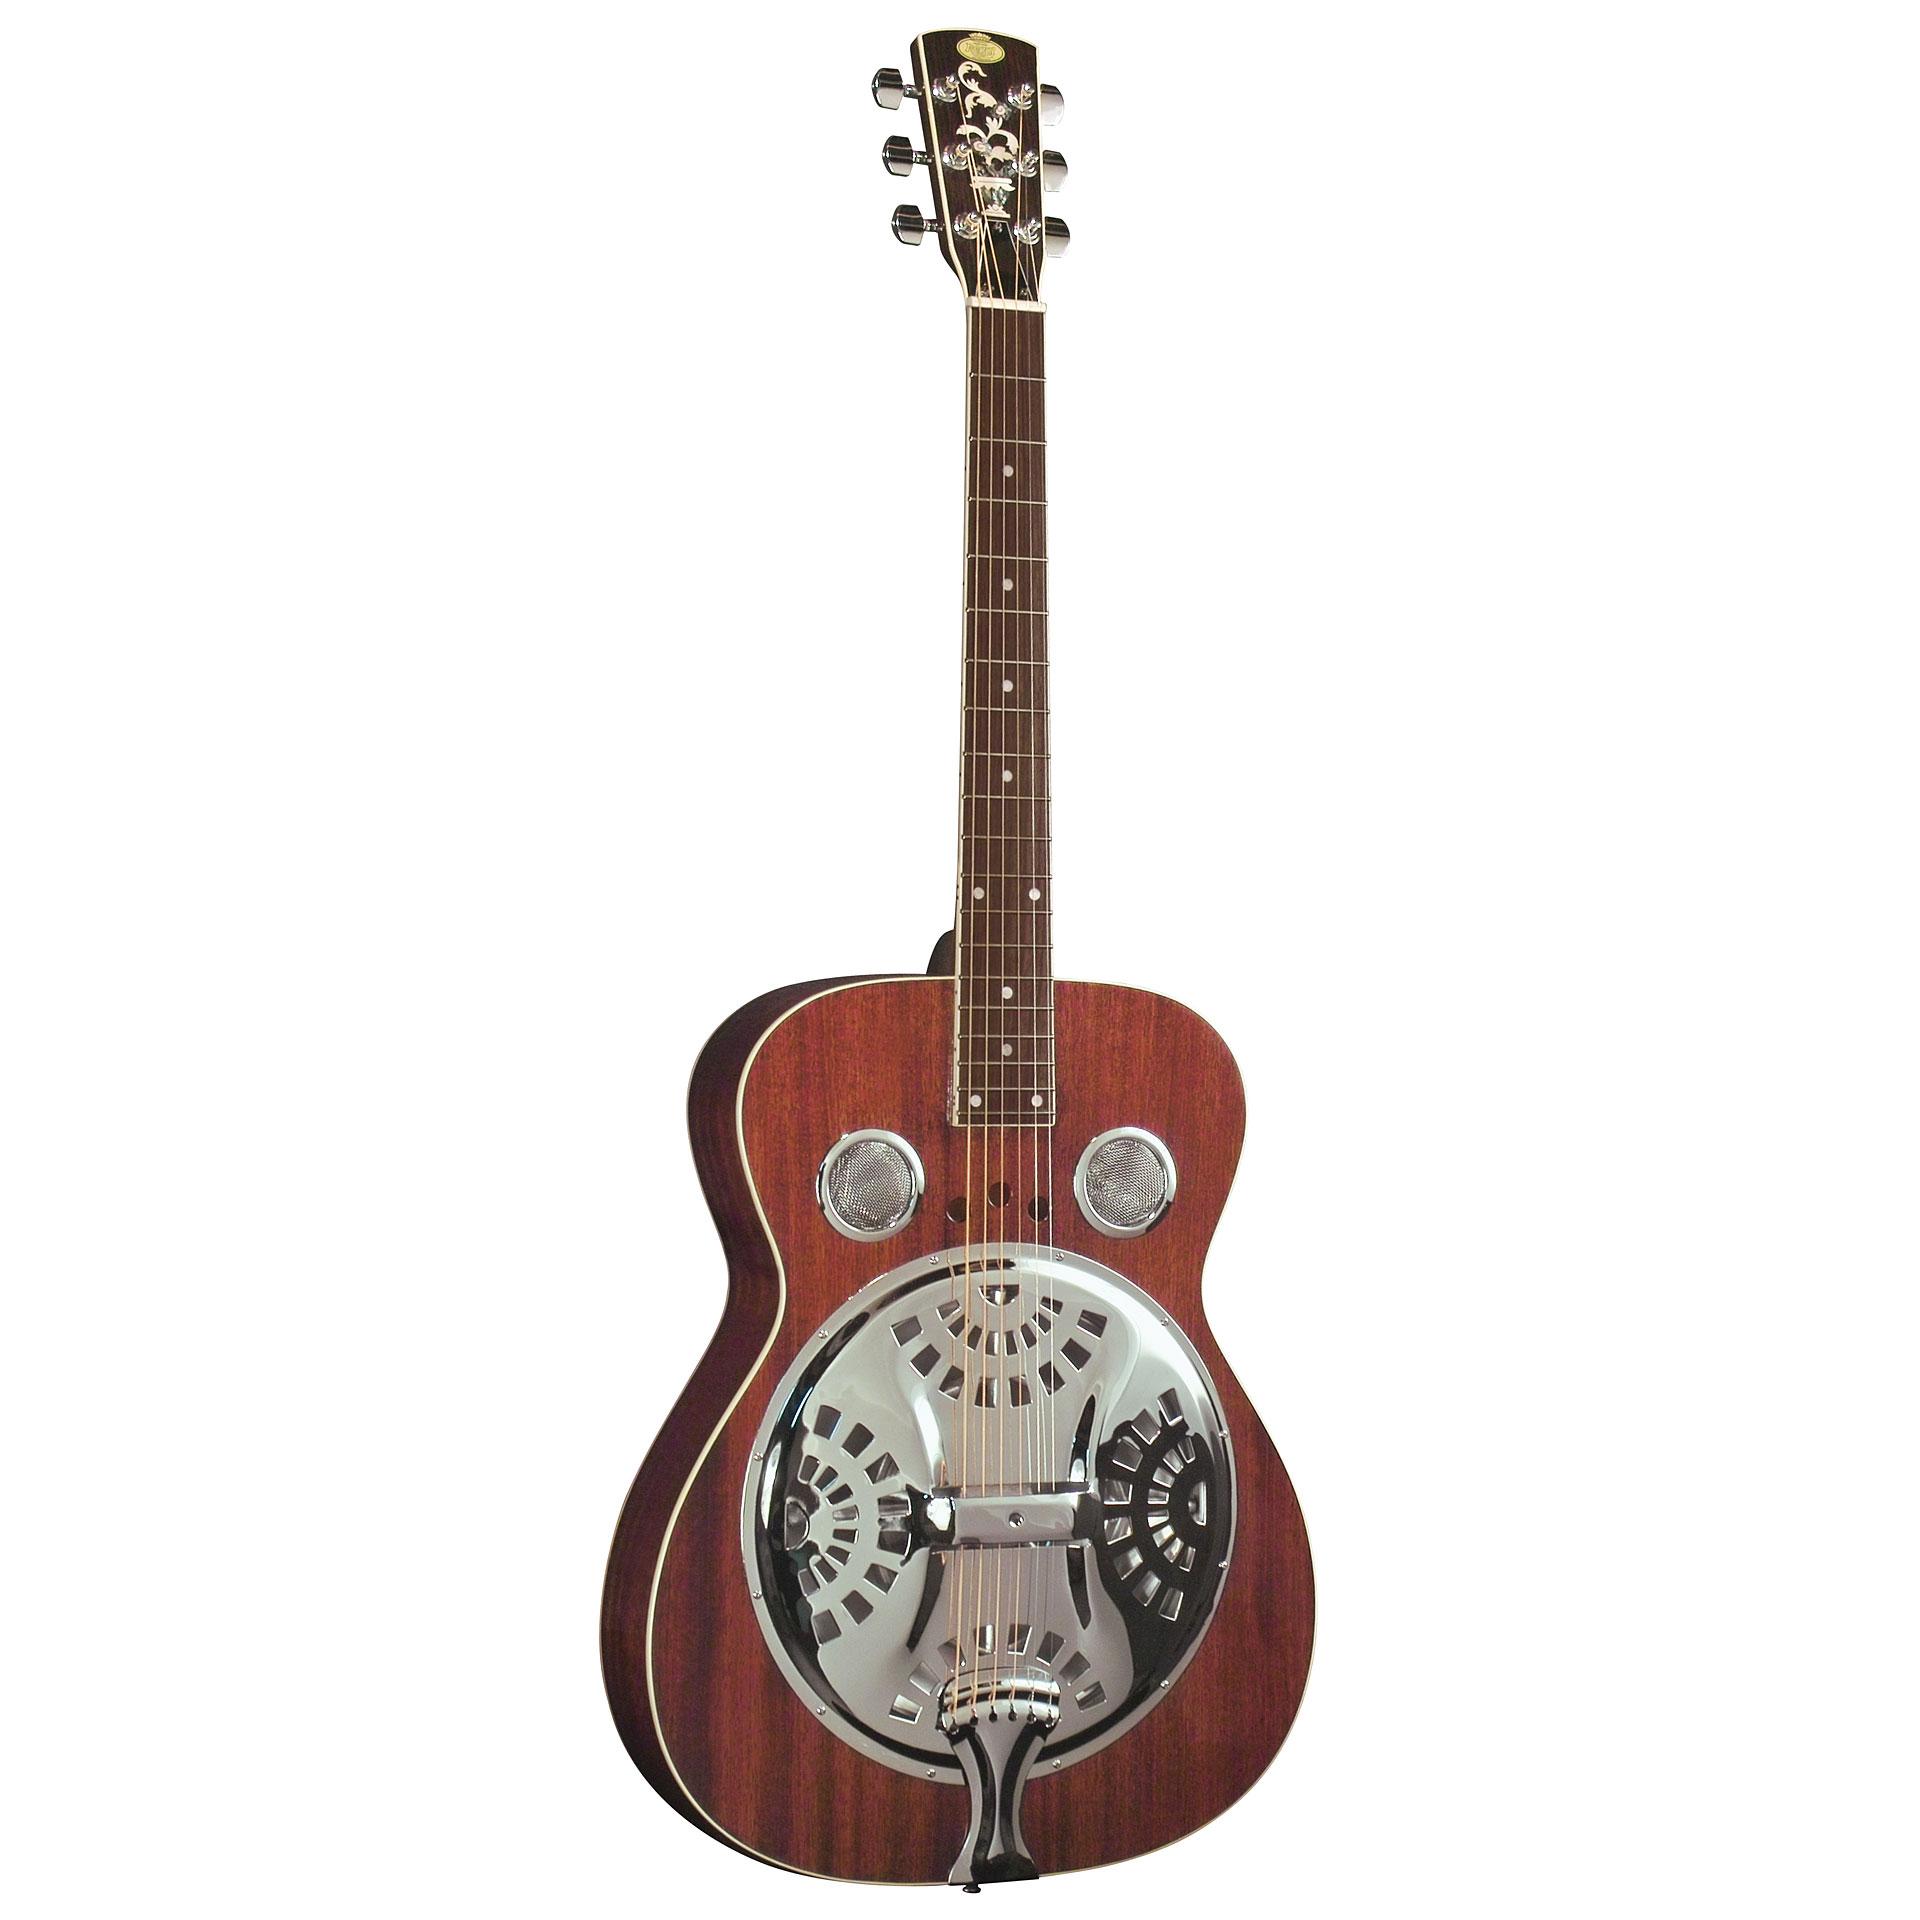 regal guitars rd 40m resonator dobro resonator. Black Bedroom Furniture Sets. Home Design Ideas